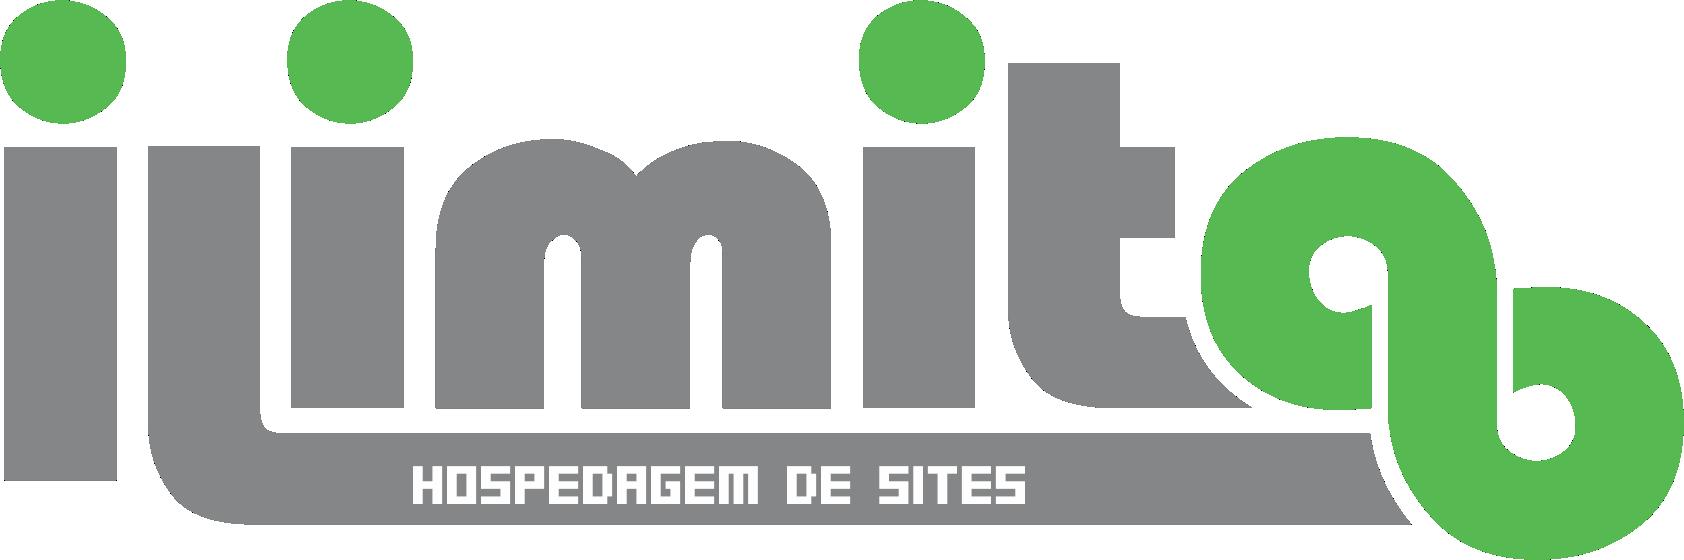 Ilimita - Hospedagem de Sites